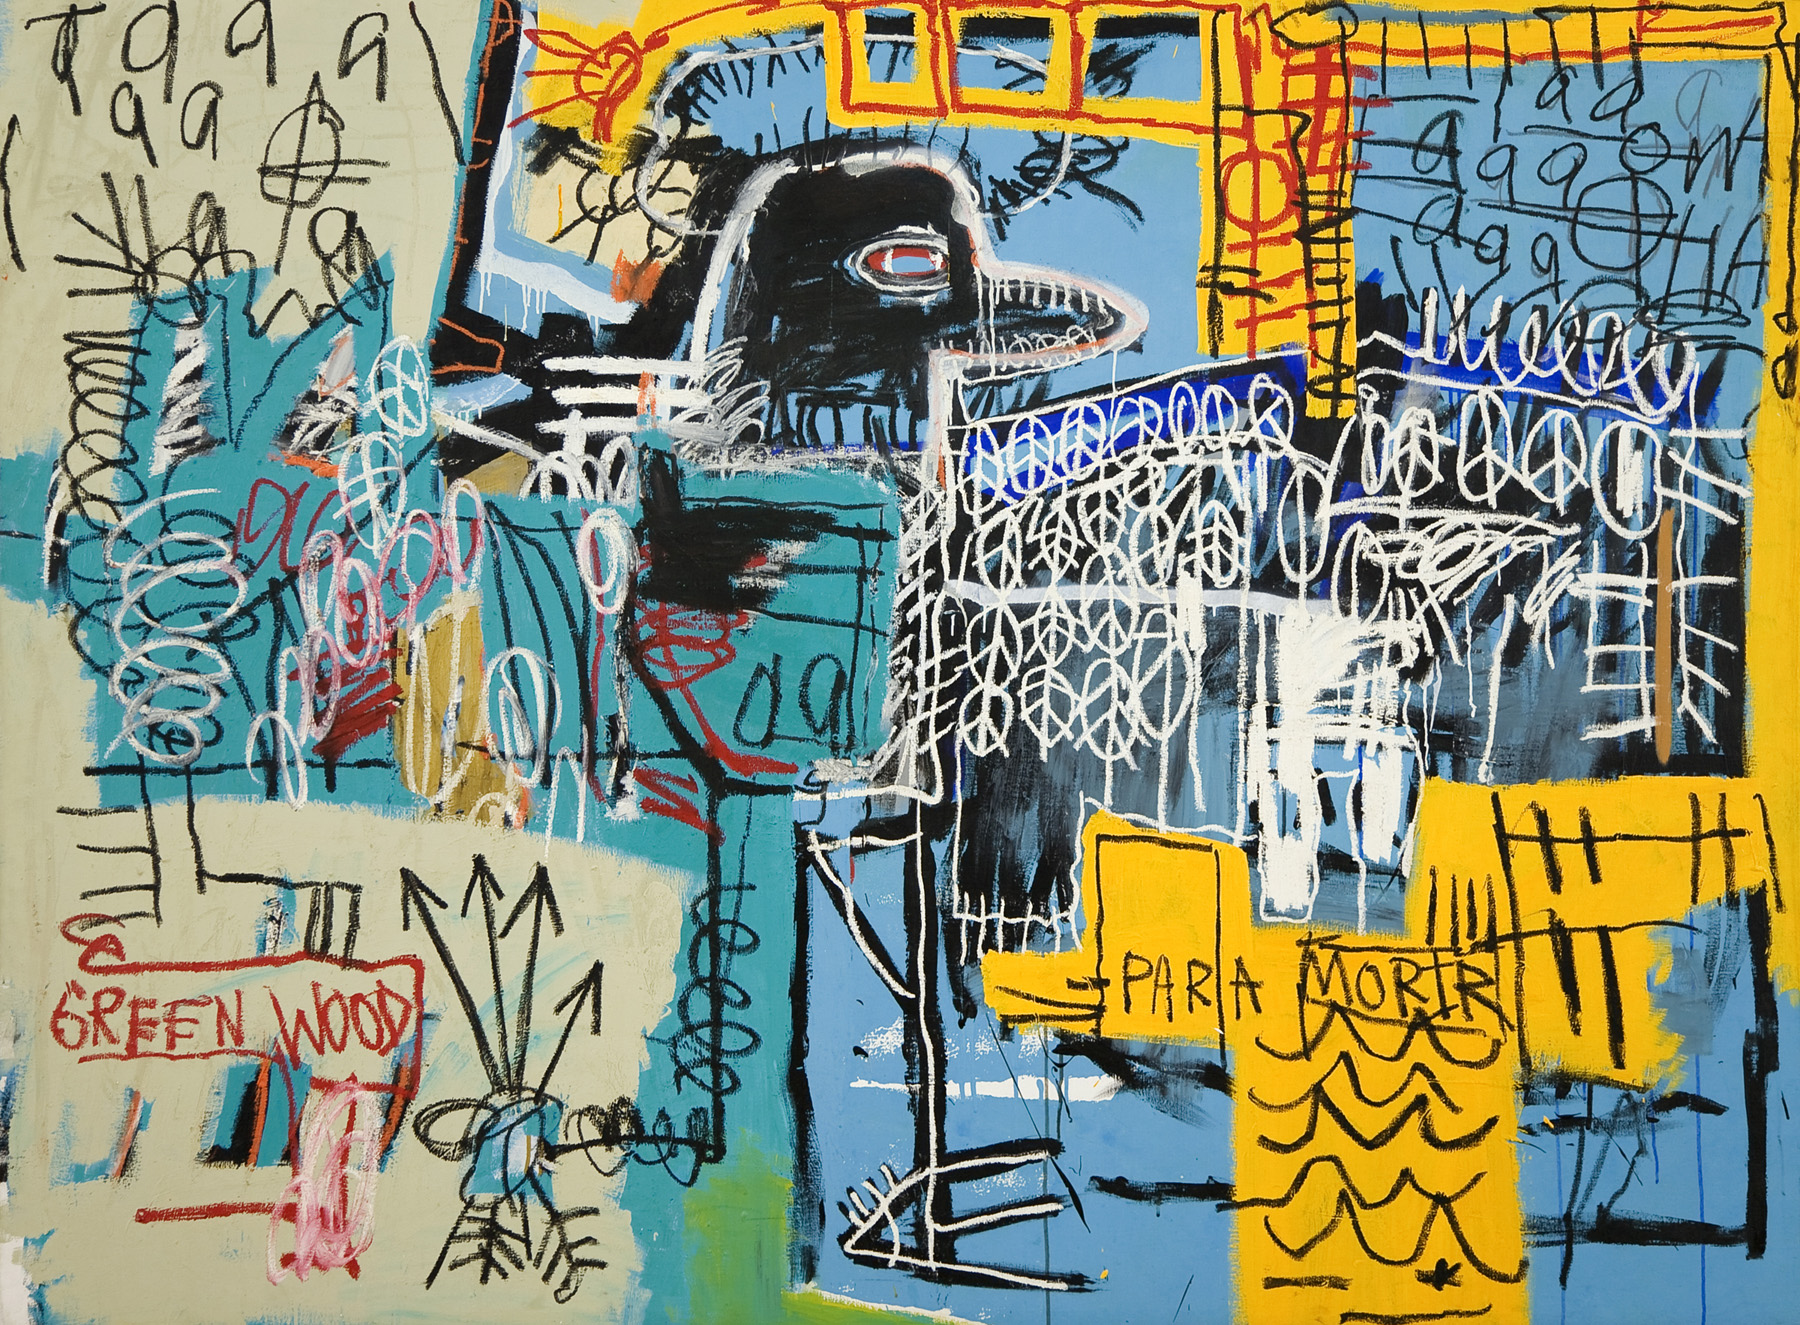 2013-09-26-BasquiatJM_BirdOnMoney.jpg